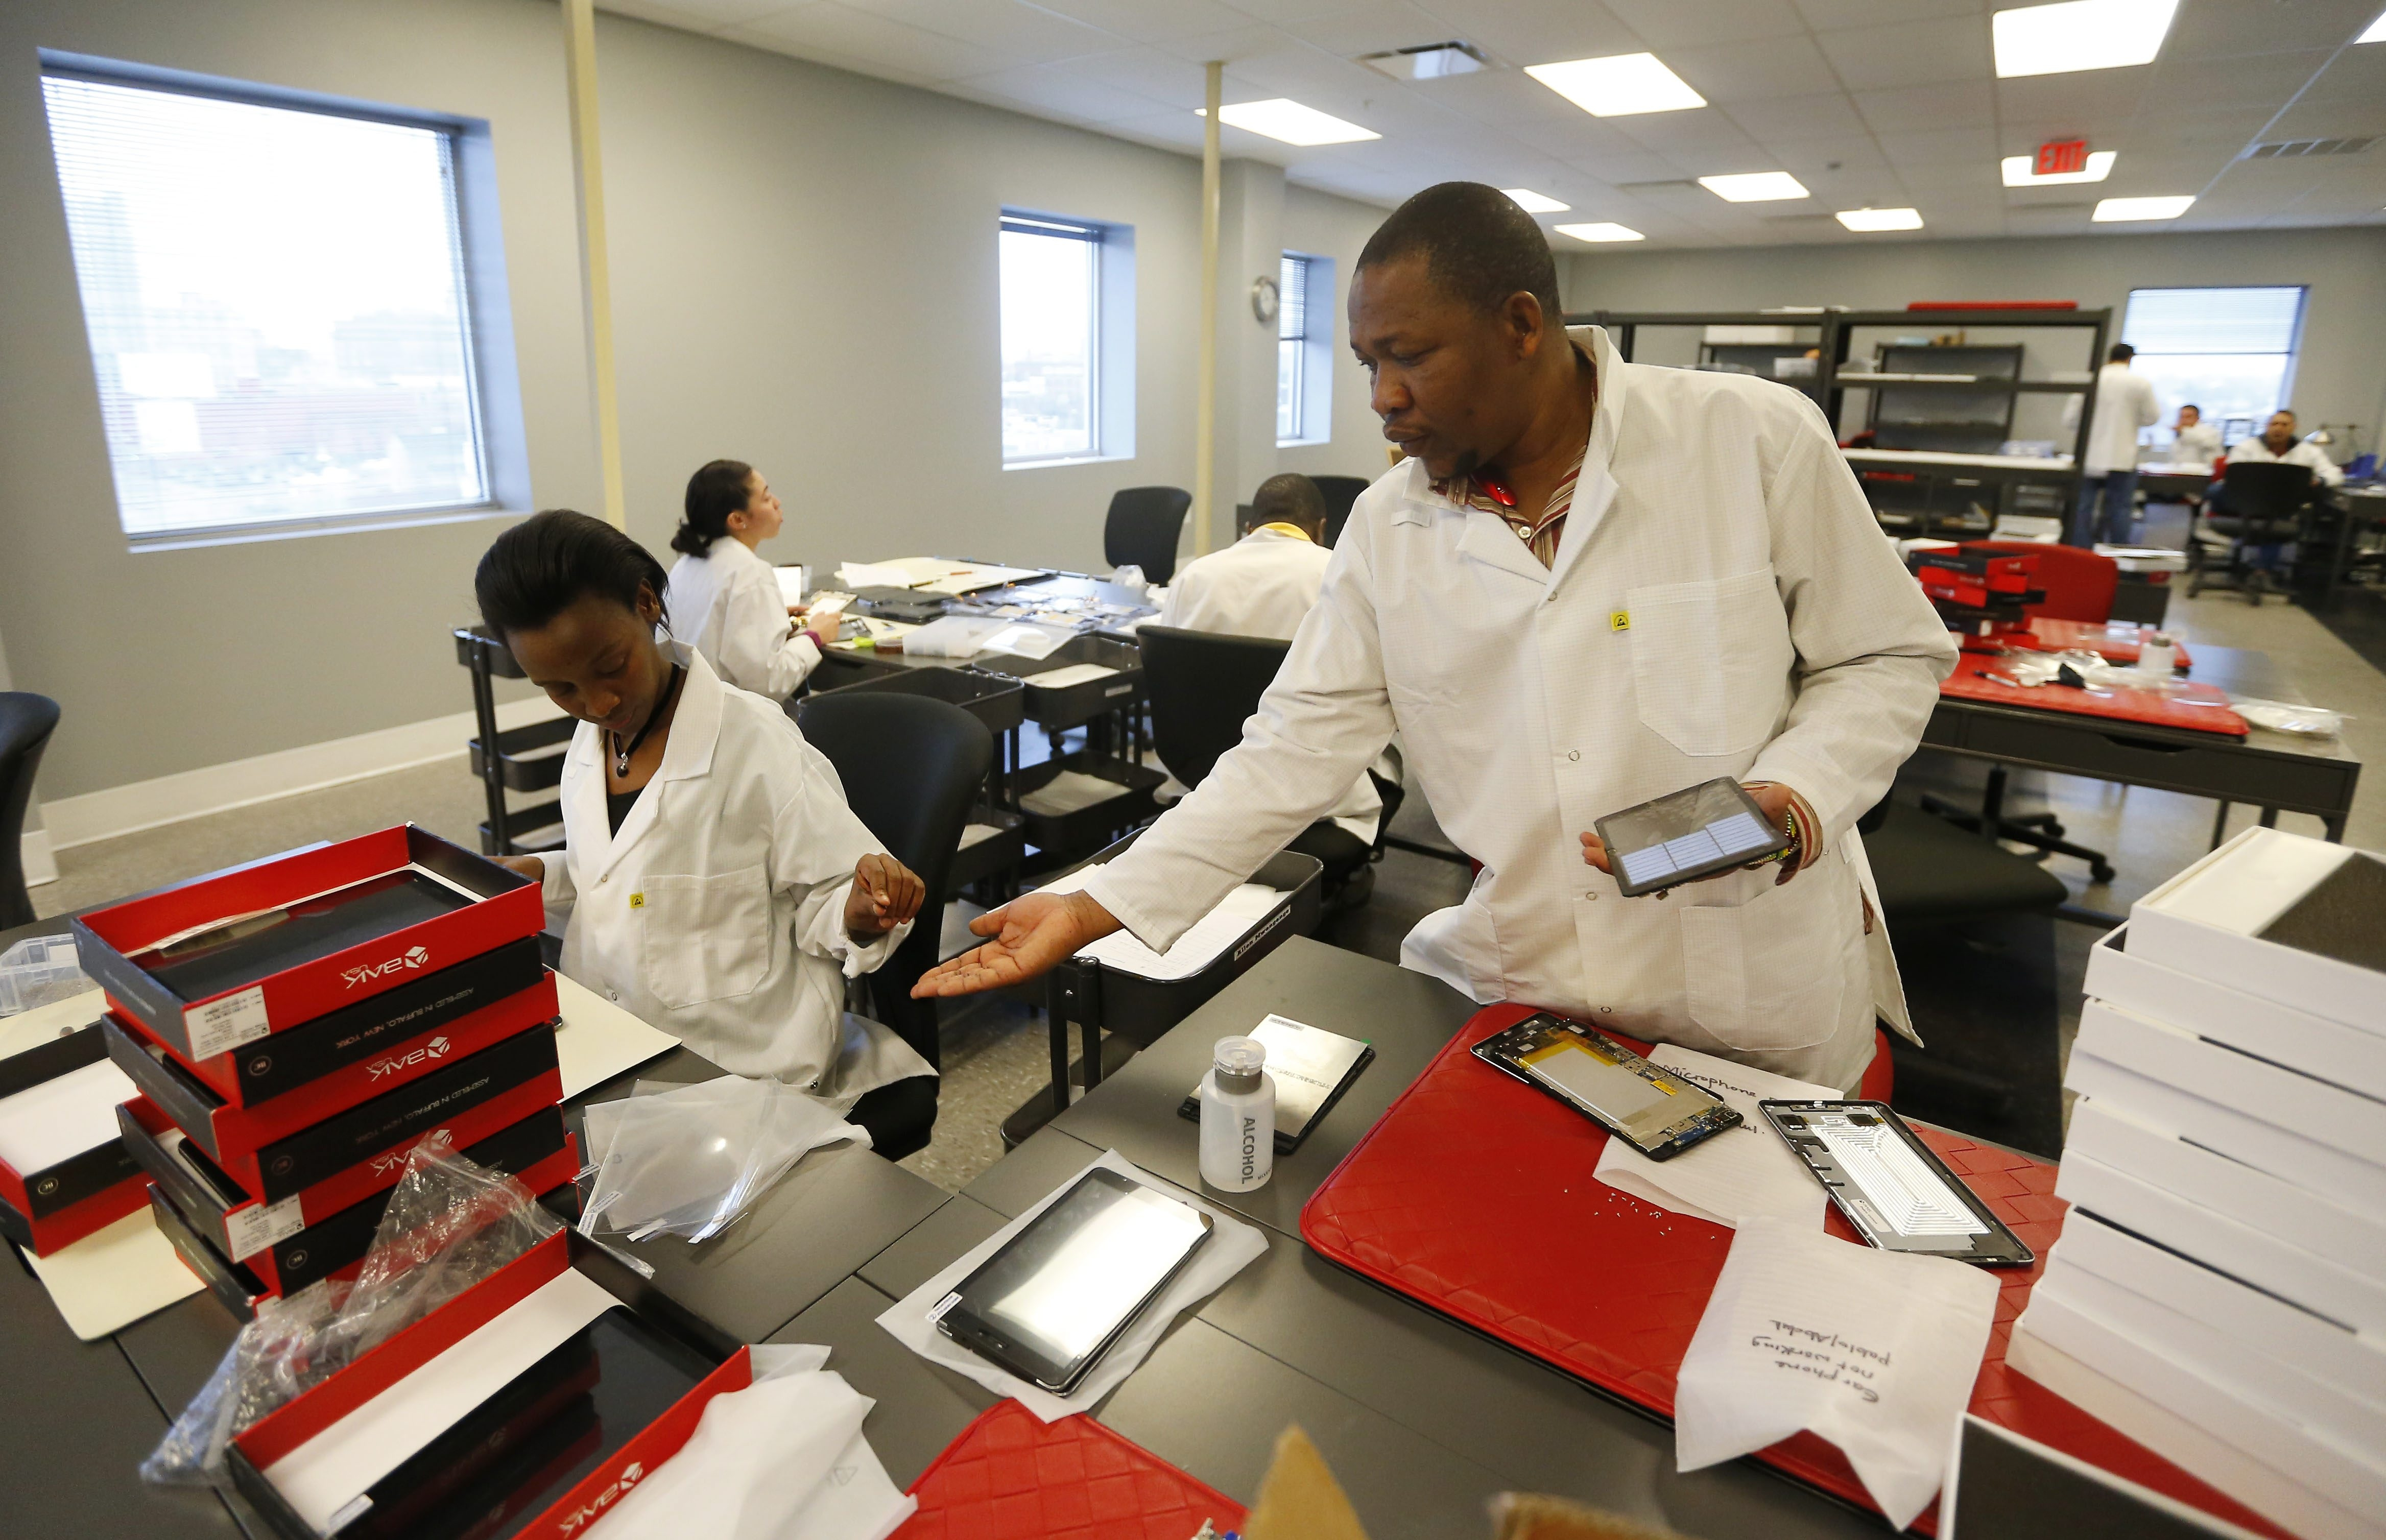 Workers produce tablets at Bak USA headquarters on Michigan Avenue in Buffalo. (Mark Mulville/Buffalo News)